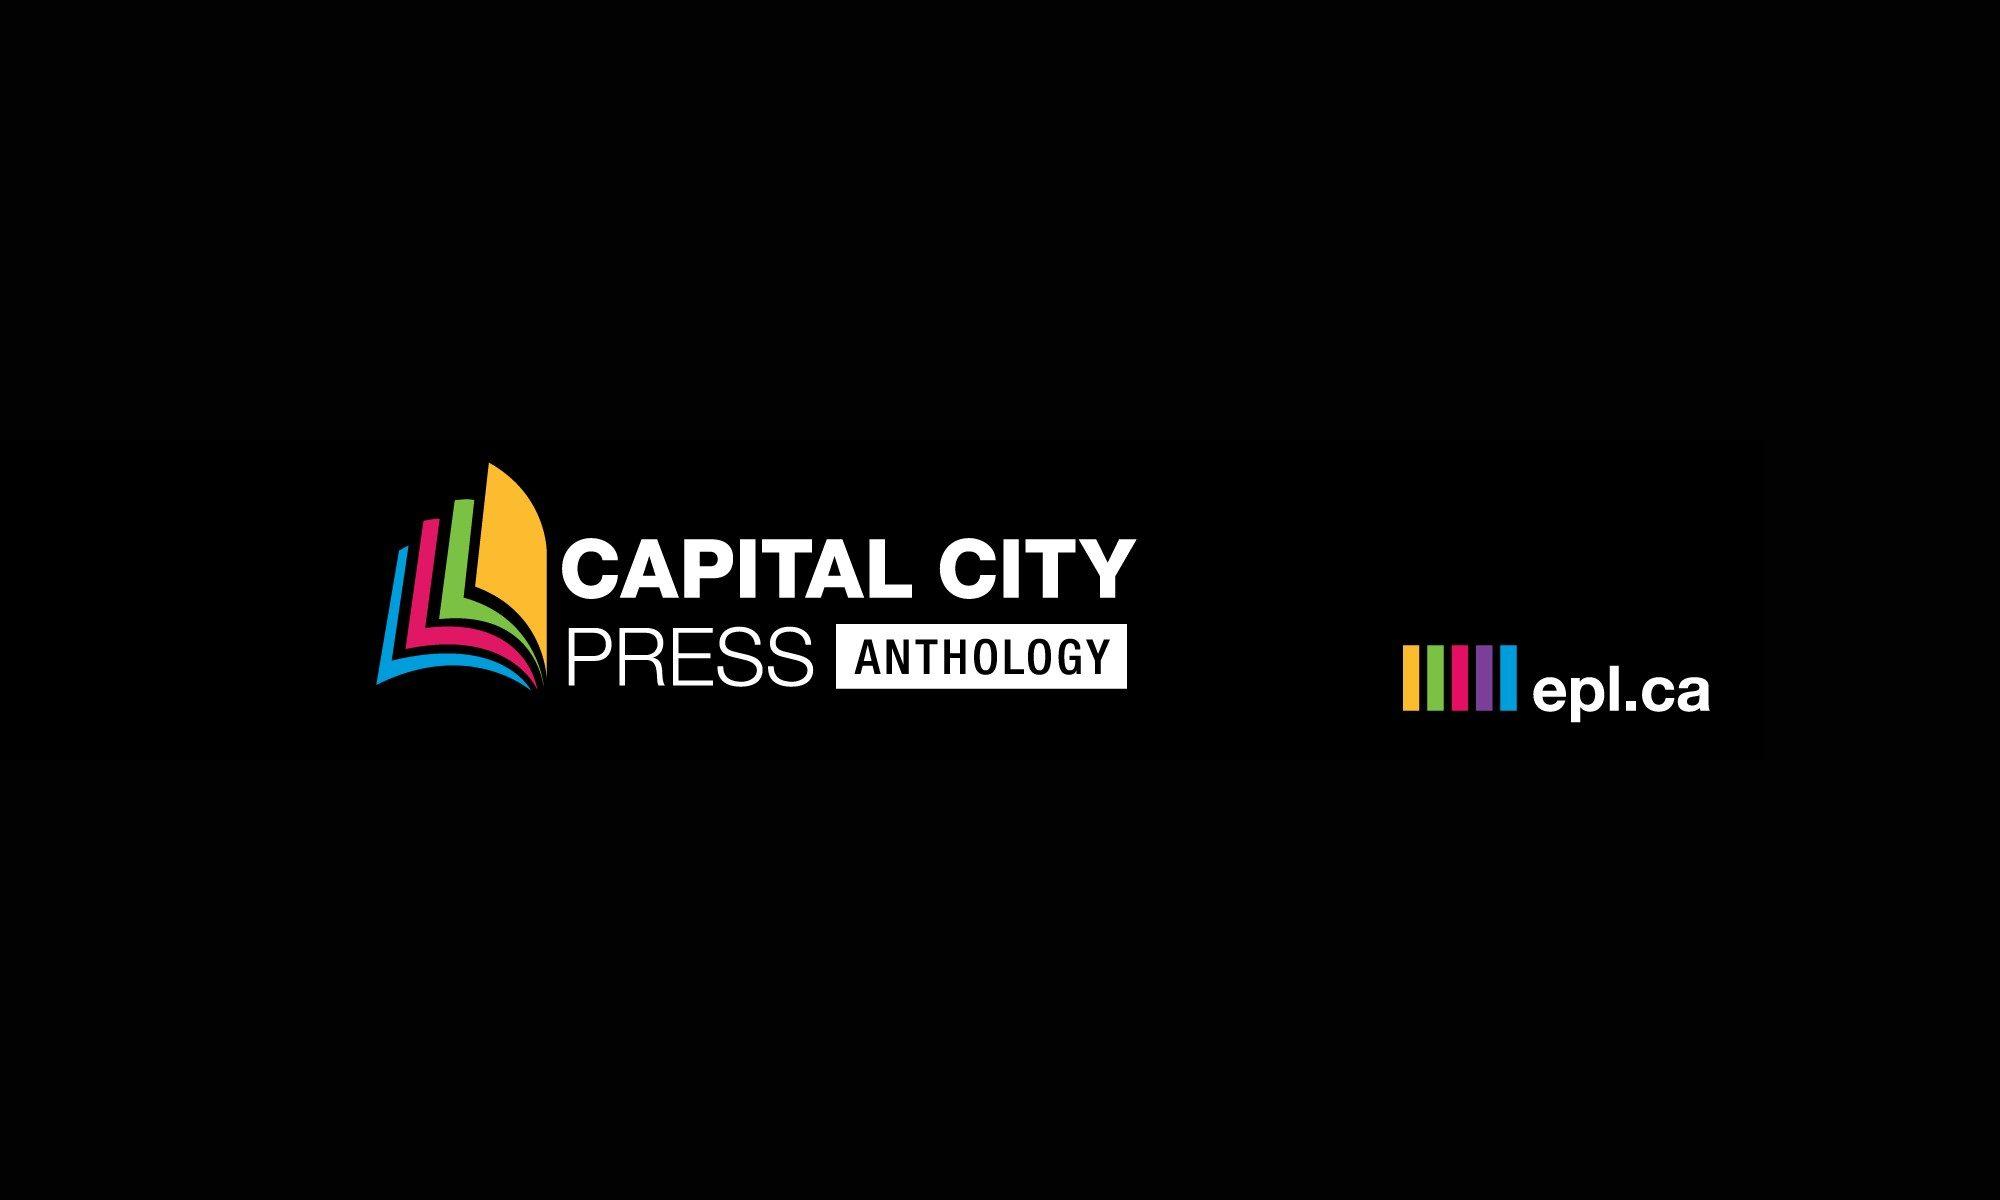 Capital City Press Anthology